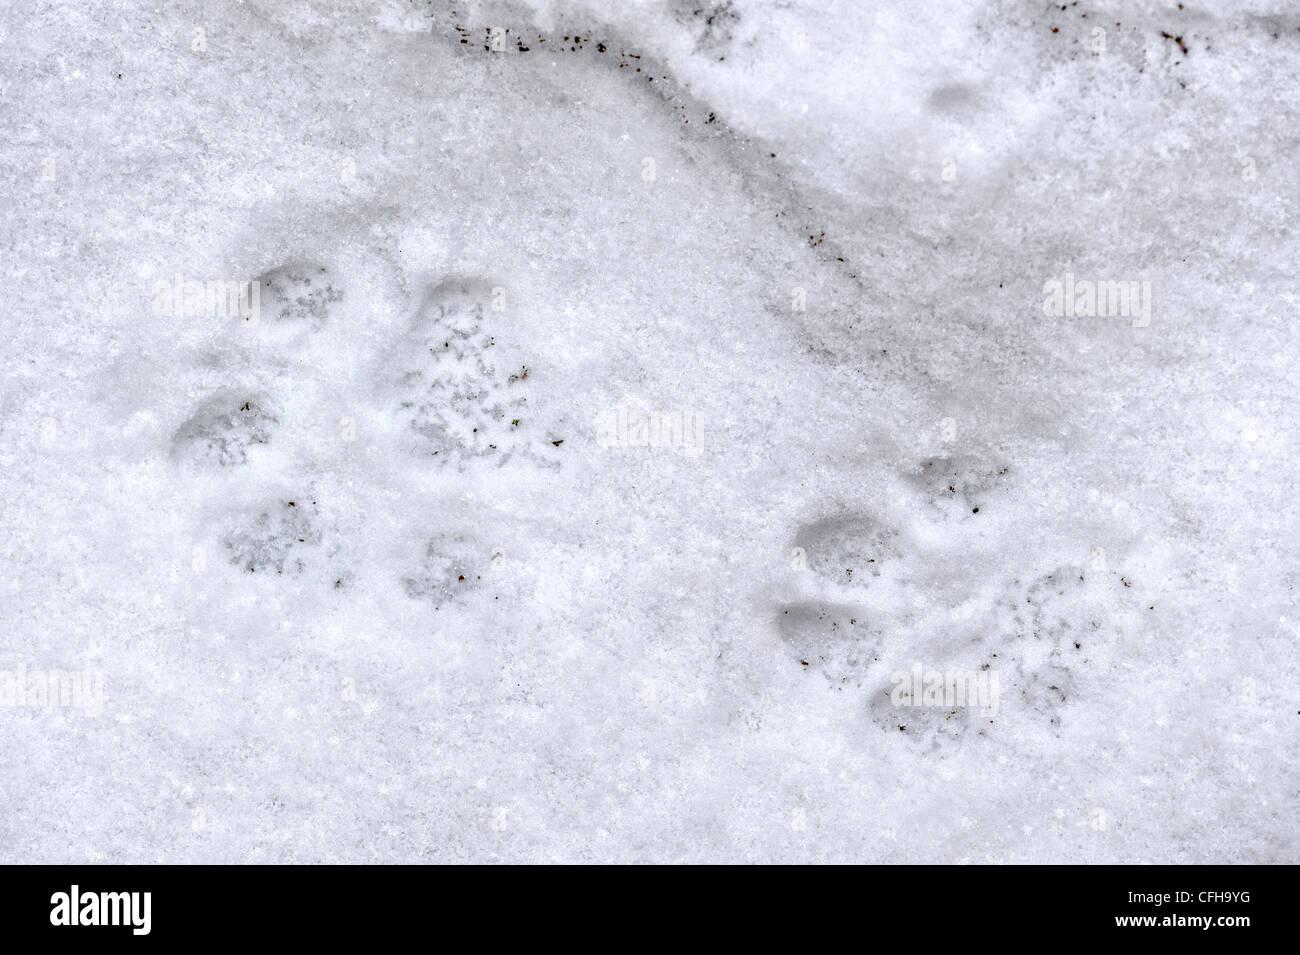 Eurasian lynx (Lynx lynx) footprints in the snow in winter, Bavarian Forest National Park, Germany - Stock Image